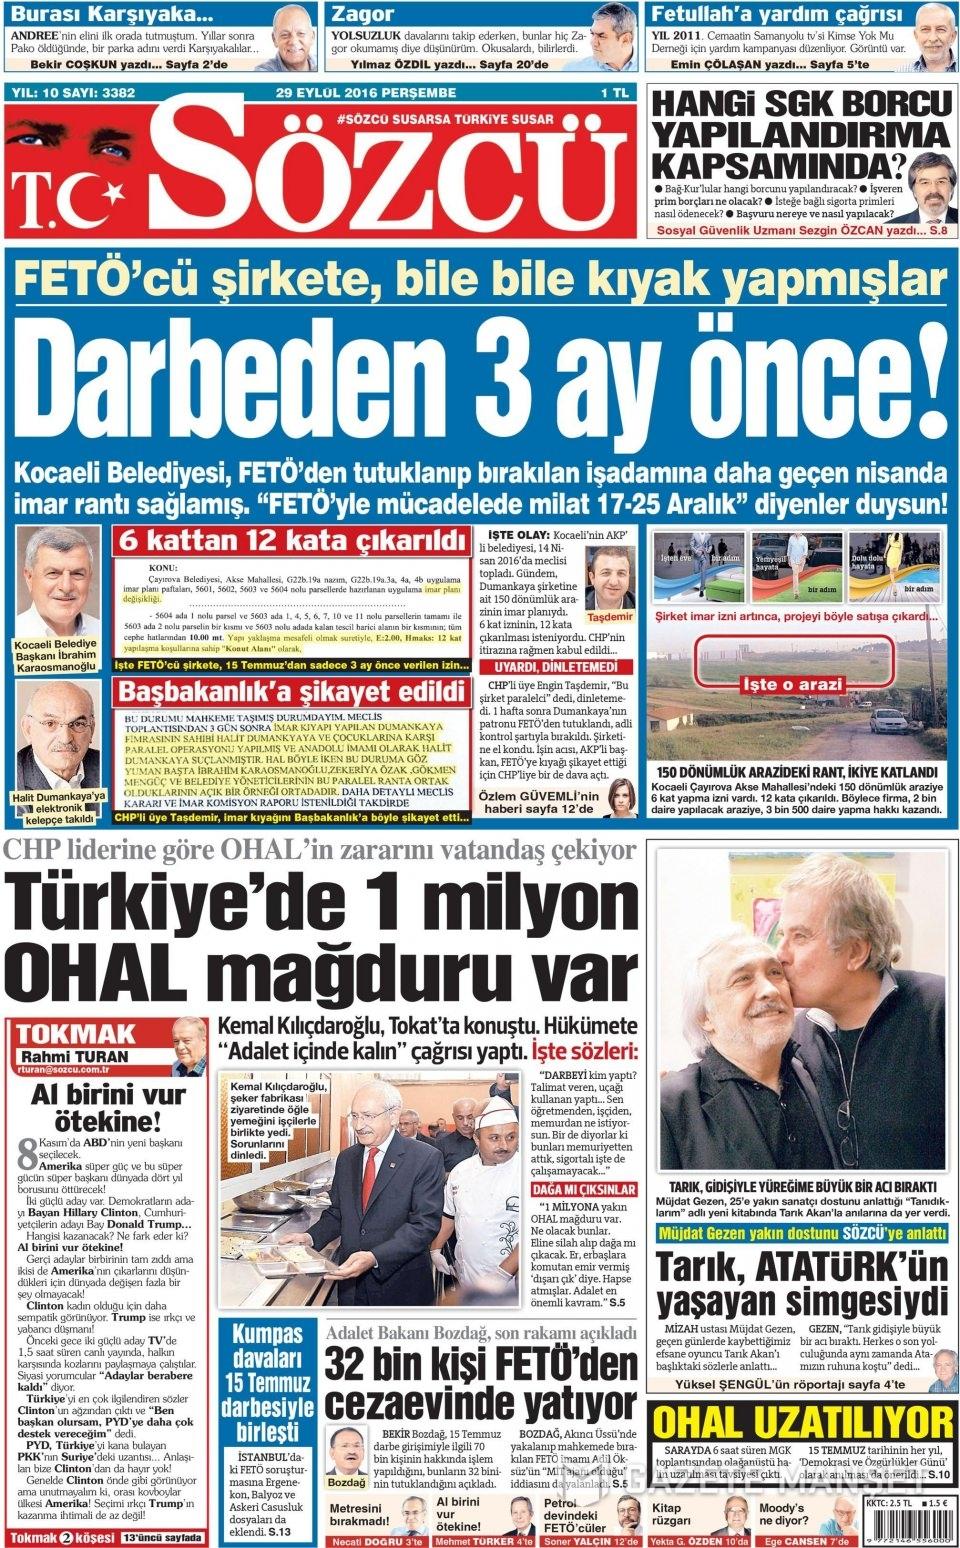 29 Eylül Perşembe gazete manşetleri 7